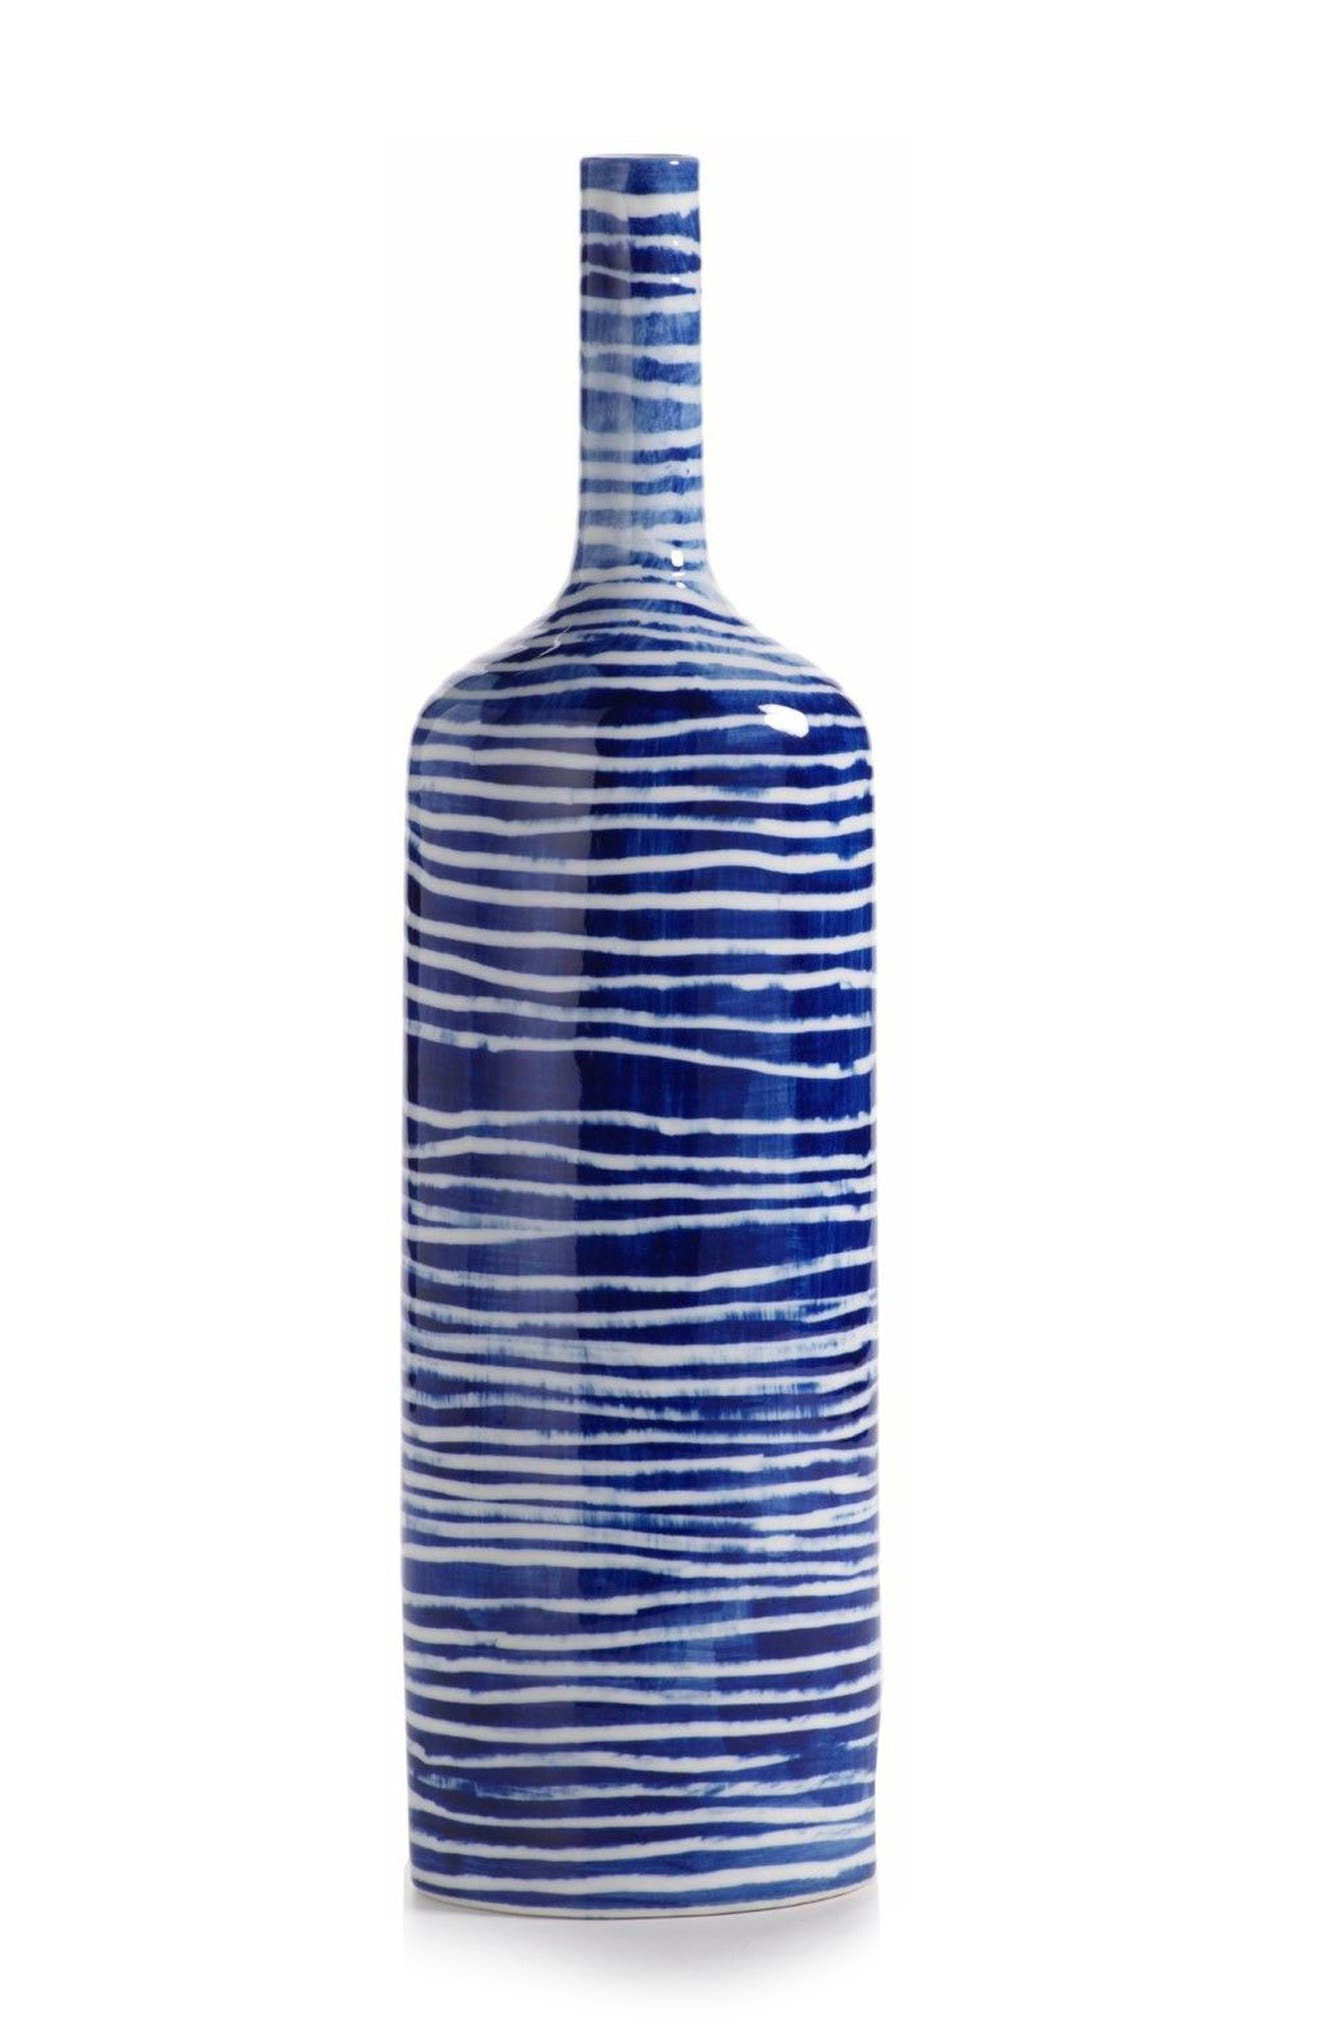 Yahto Decorative Ceramic Bottle,                             Main thumbnail 1, color,                             400